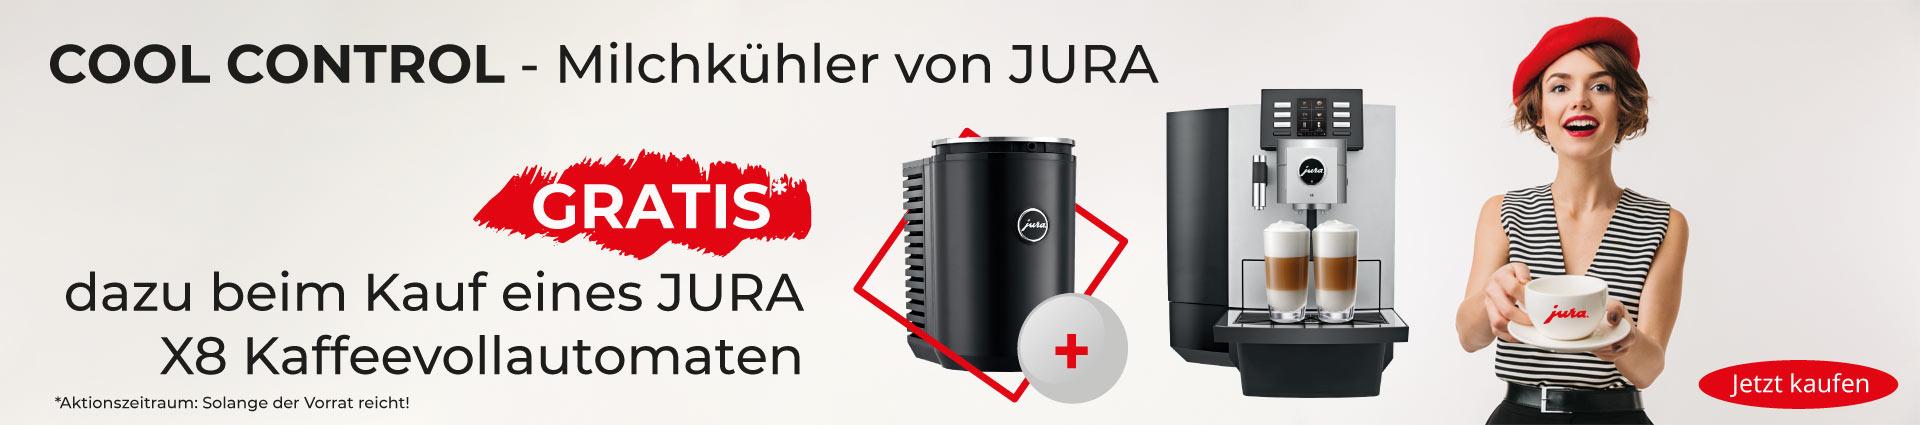 JURA X8 Banner Cool Control